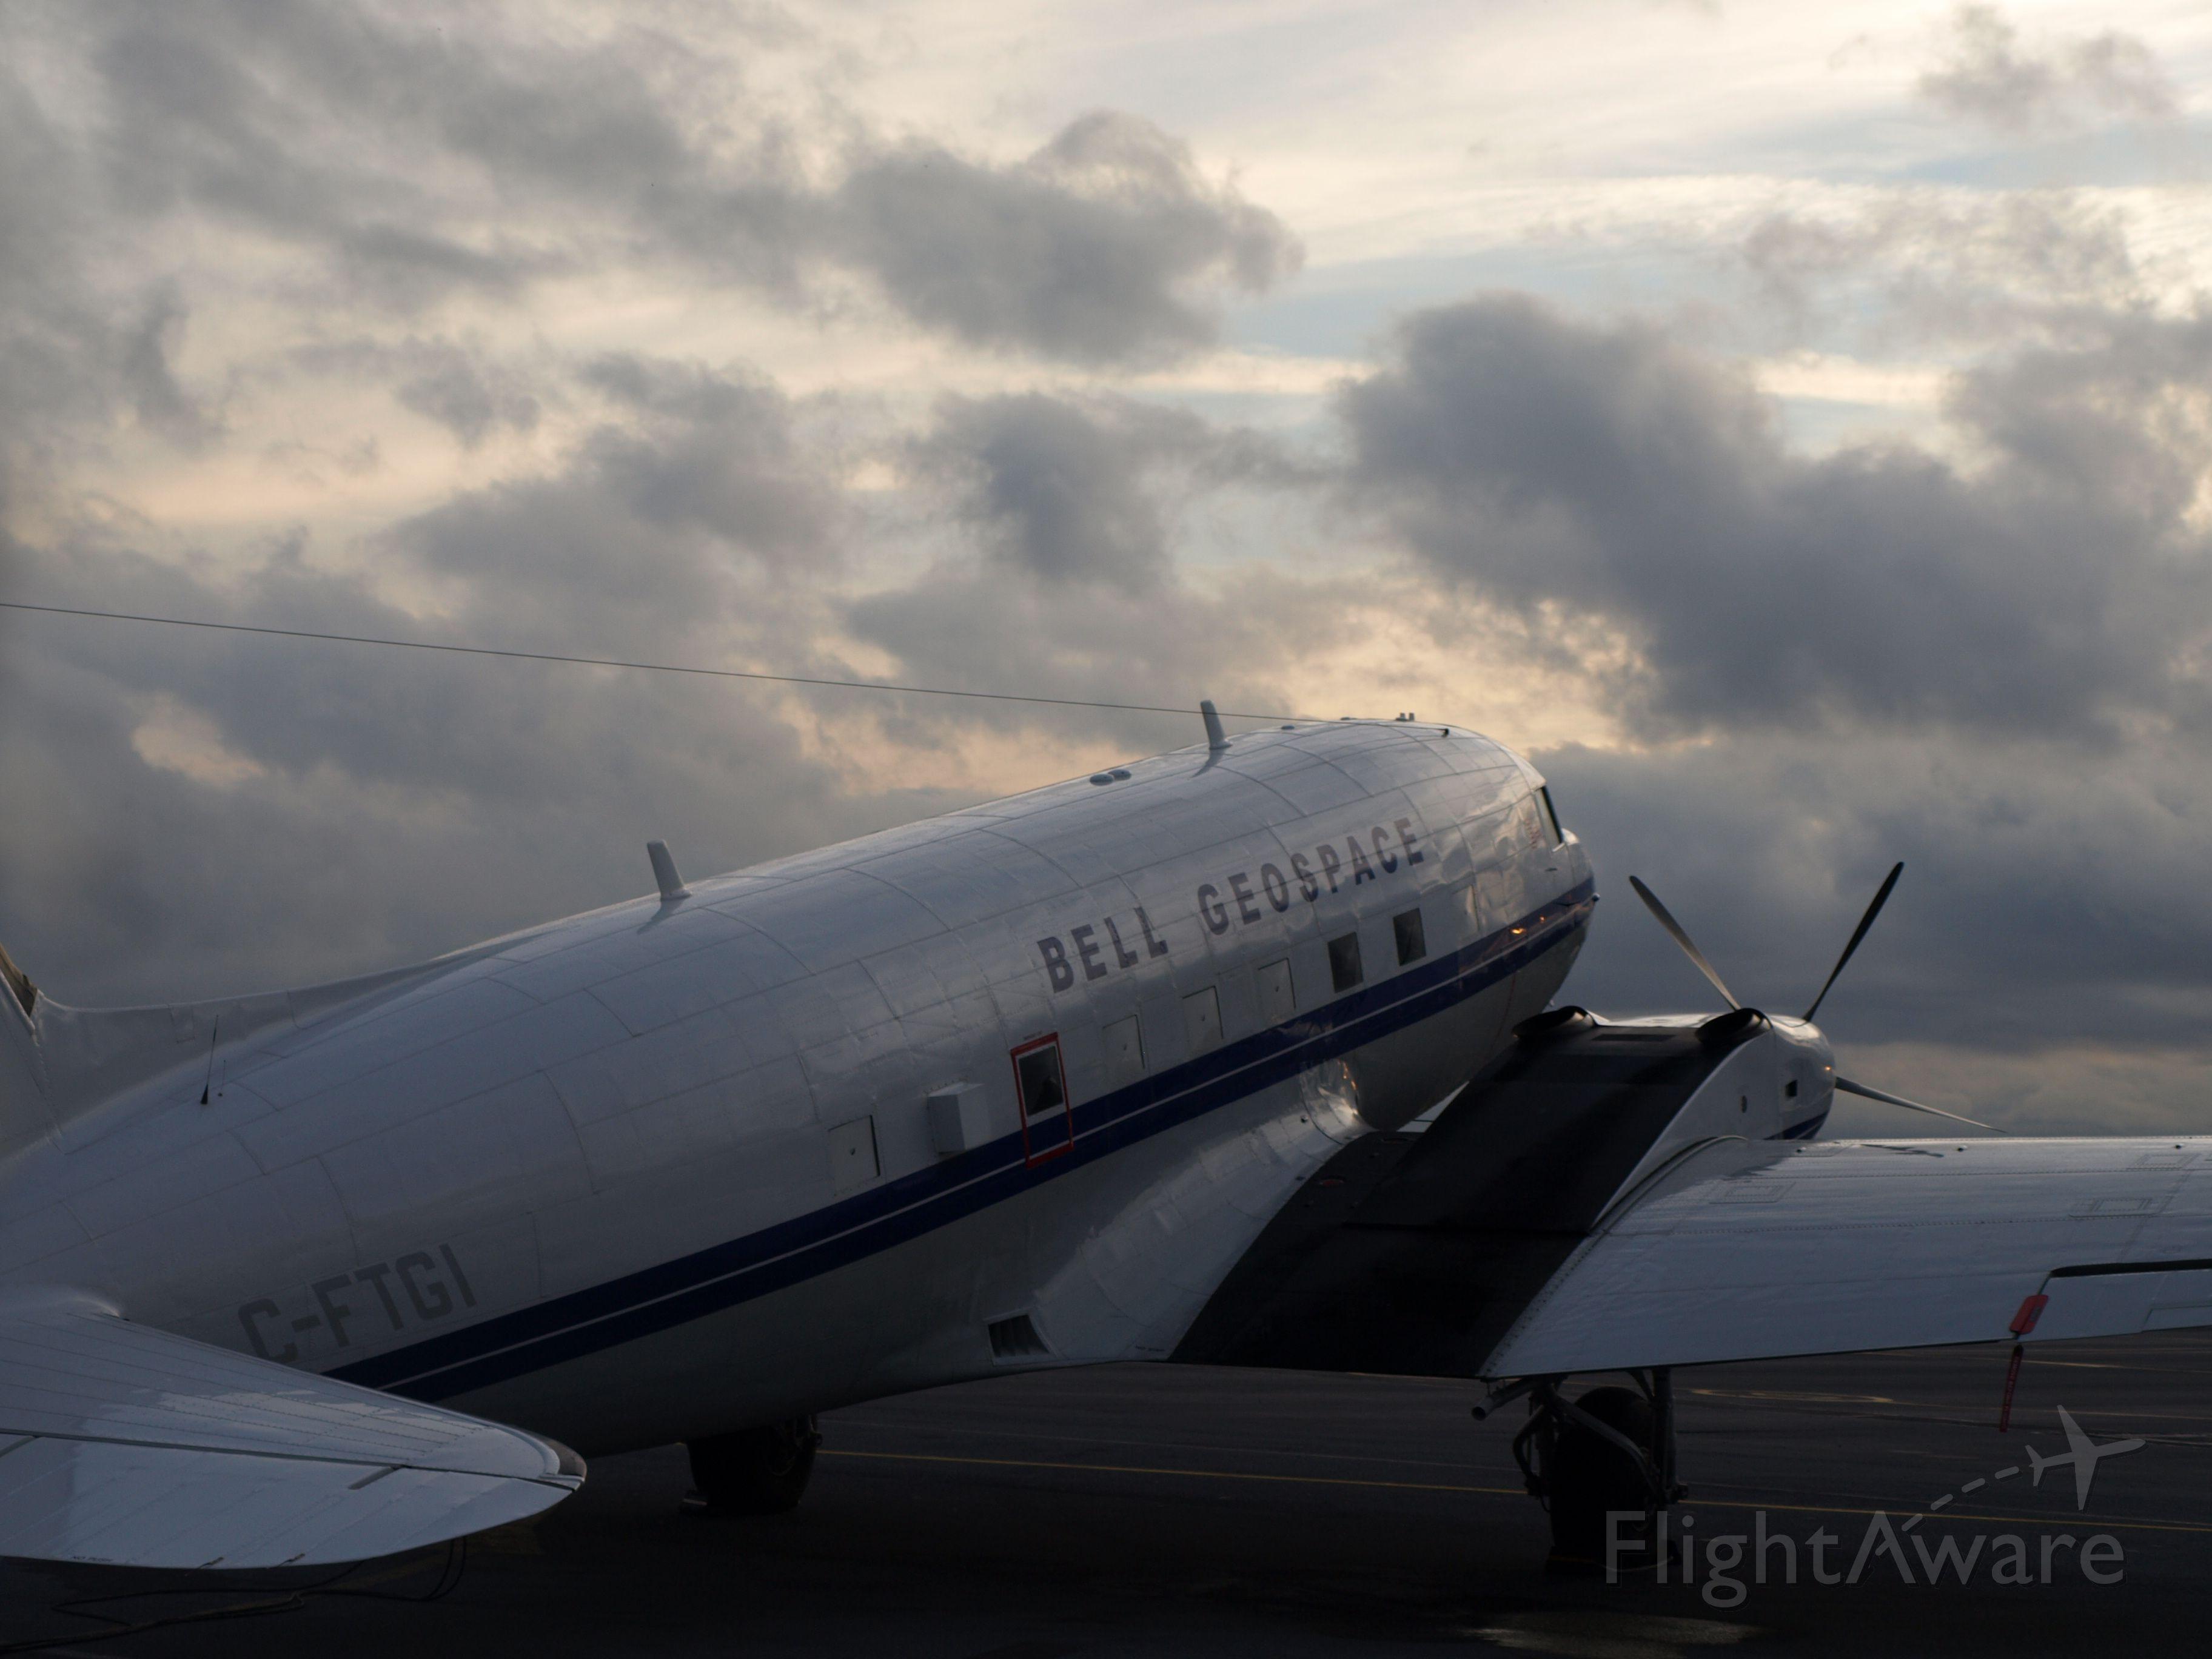 Douglas DC-3 (C-FTGI)